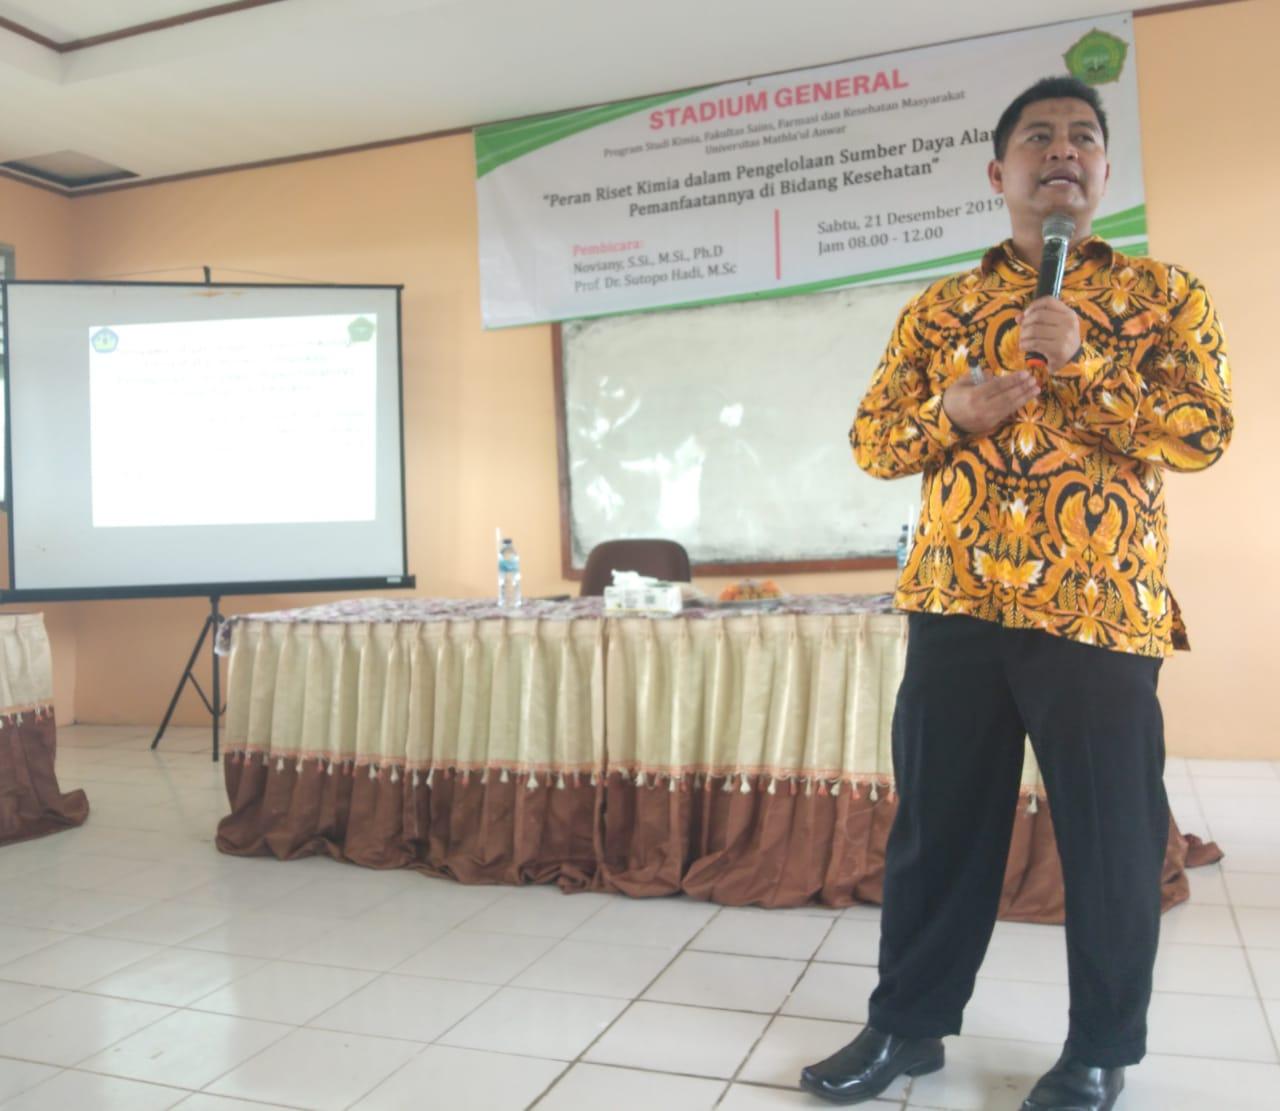 Program Studi Kimia FSFK Unma Banten Laksanakan Stadium General